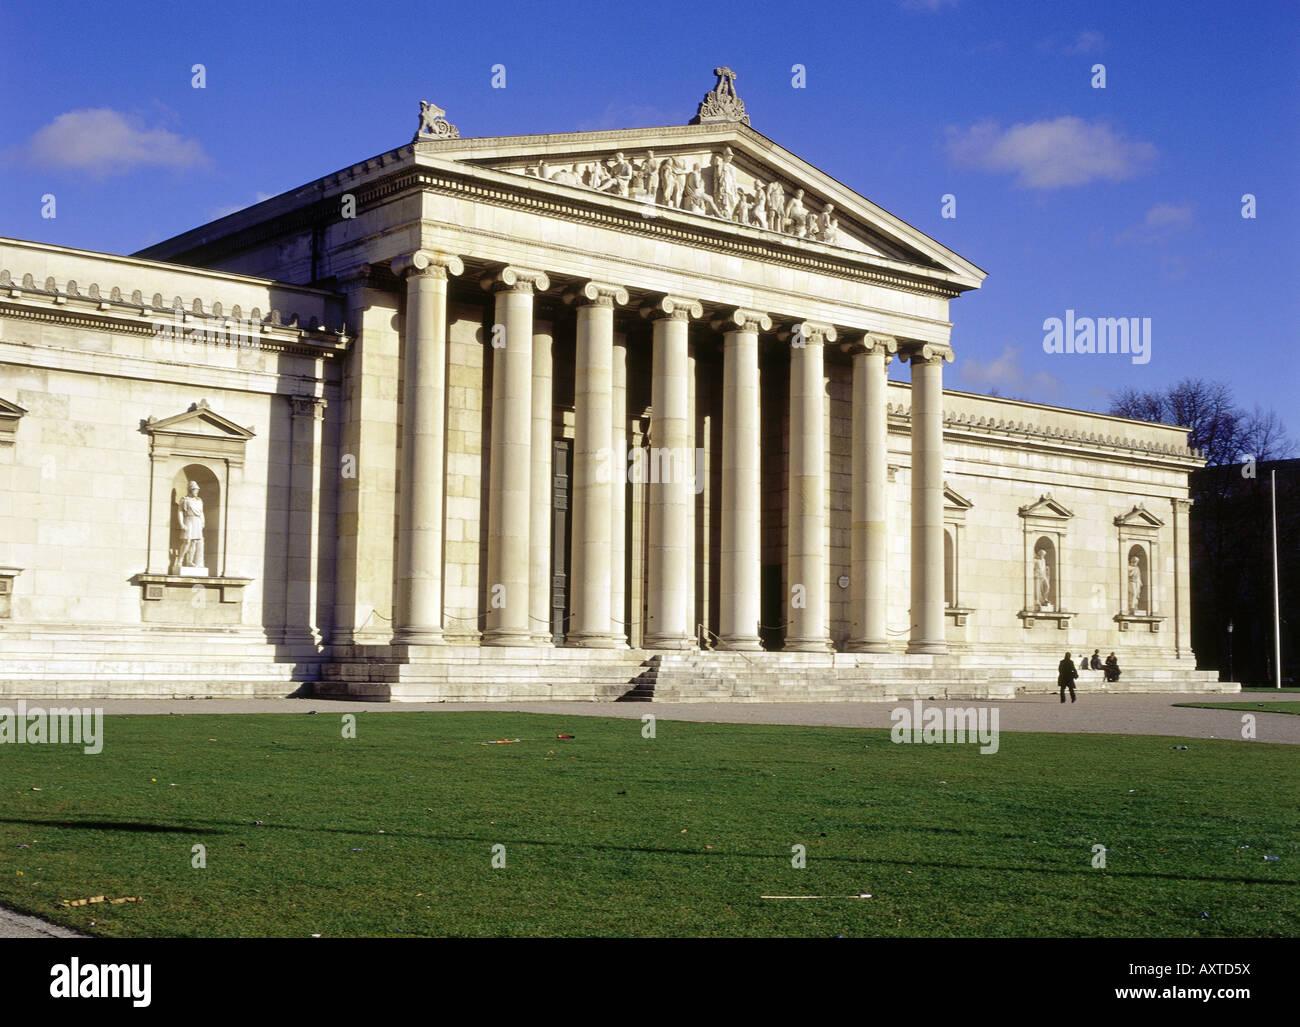 Munich Museum - Visitors sights